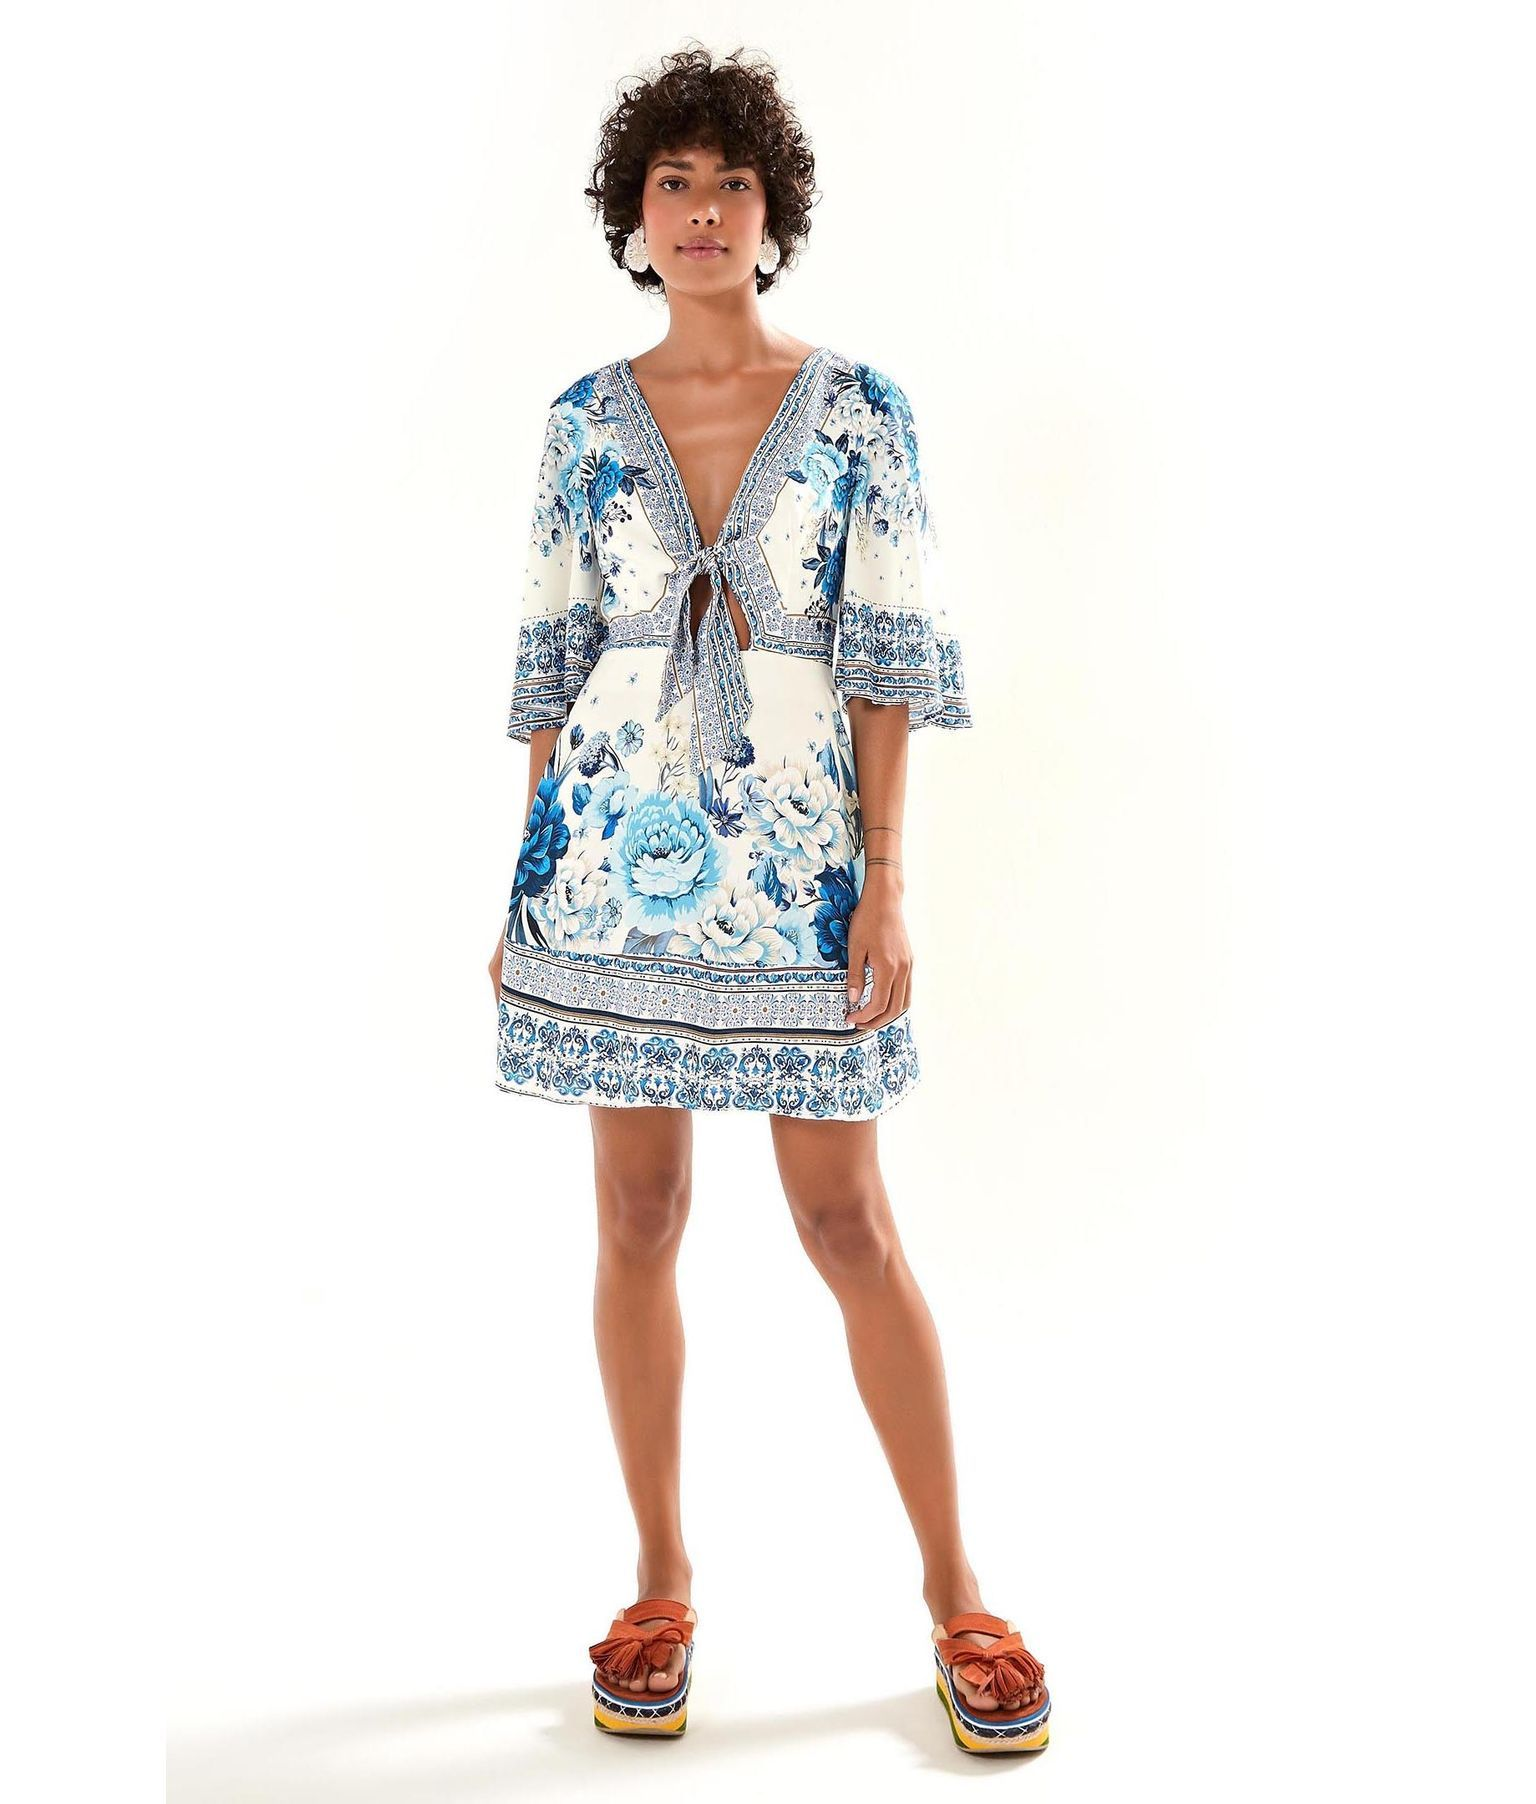 60703e2ea Vestido Laco Chita Azulejo Tudo sobre e-farm GANHE  DESCONTO + FRETE GRATIS  🦋